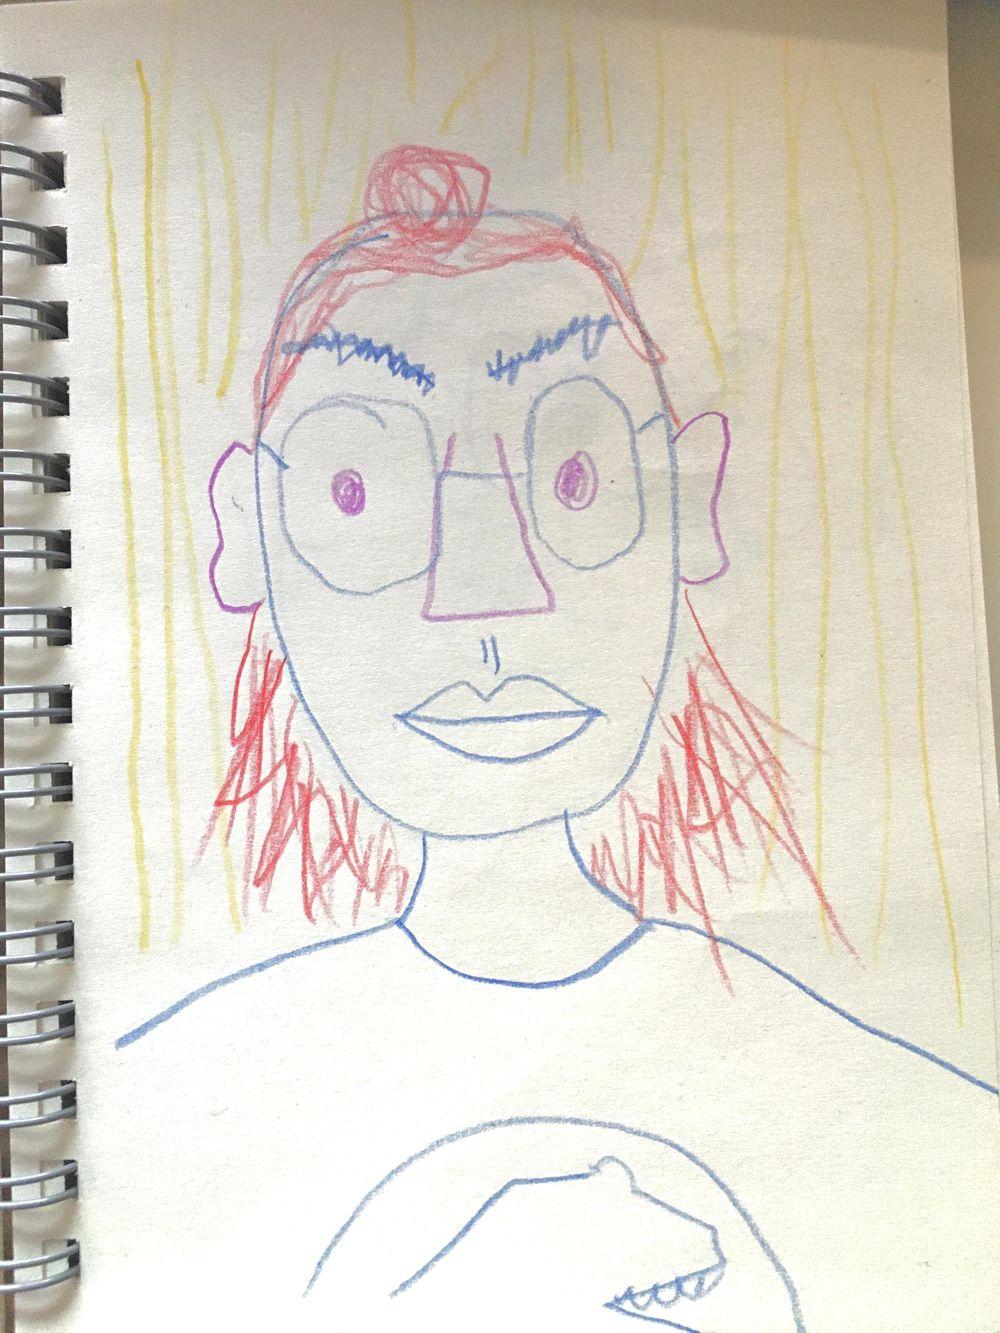 self-portraits - image 2 - student project